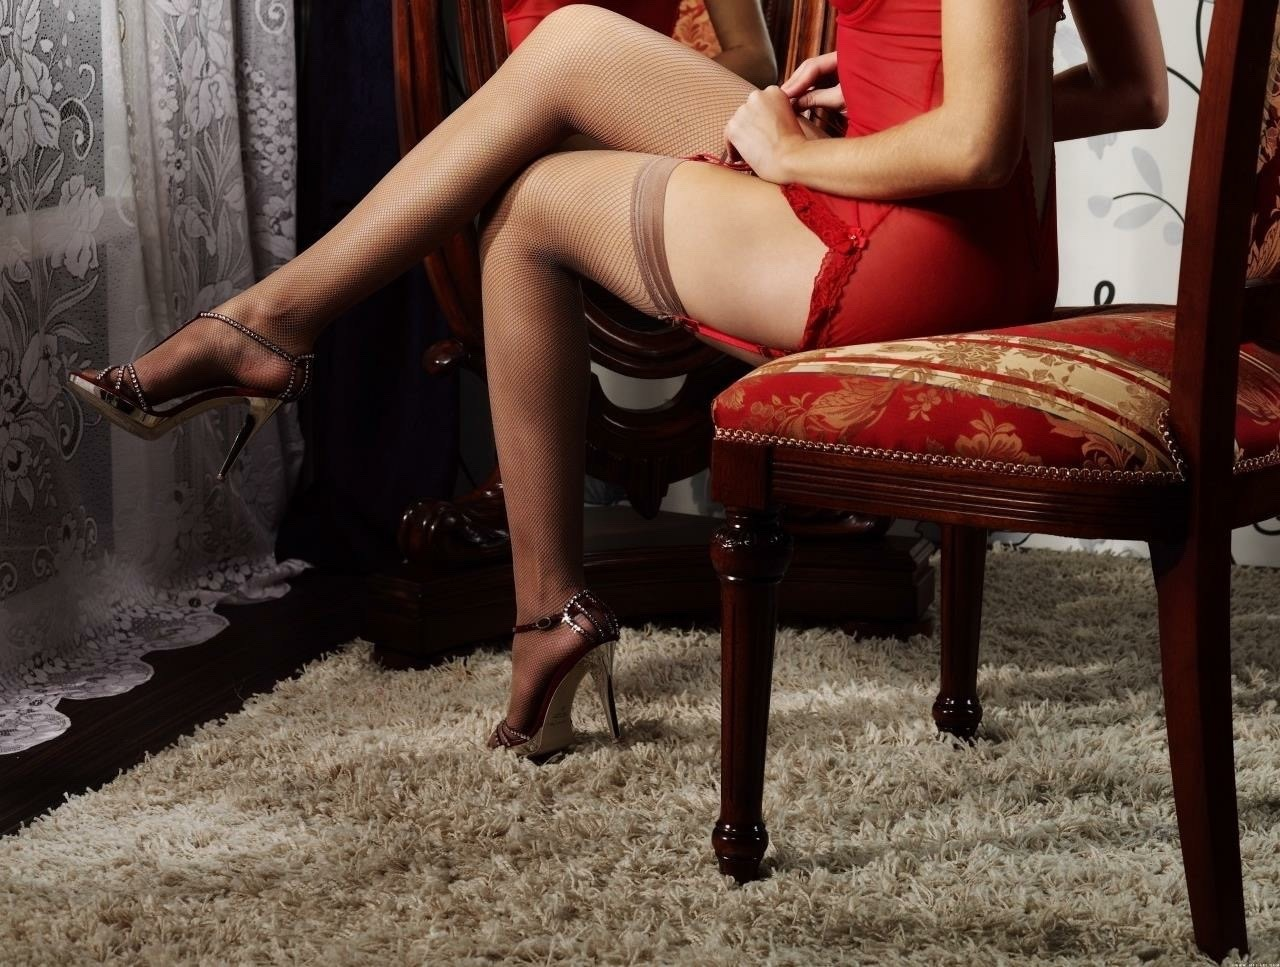 Leg strappy heels porn